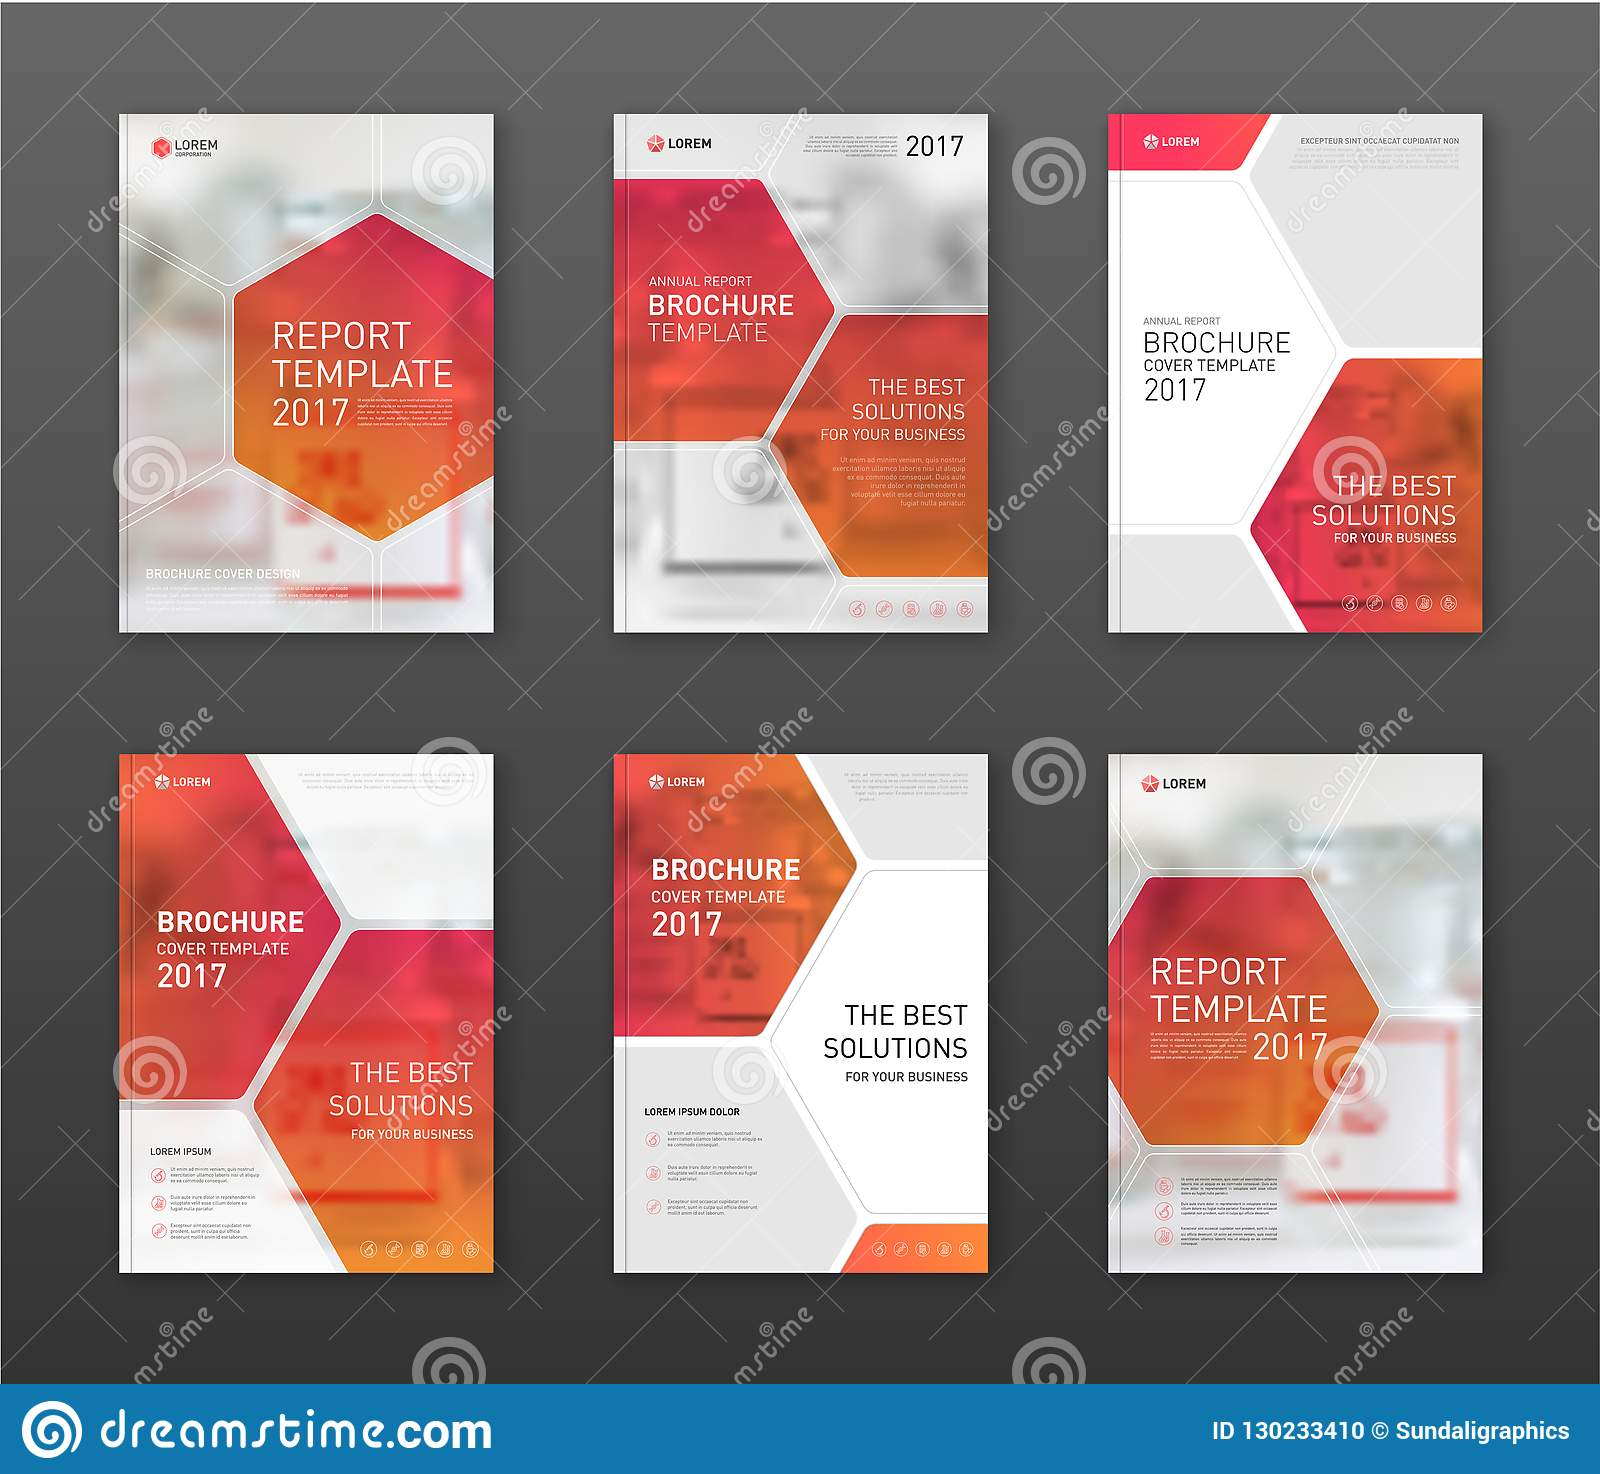 Pharmaceutical Brochure Cover Templates Set. Stock Vector For Pharmacy Brochure Template Free